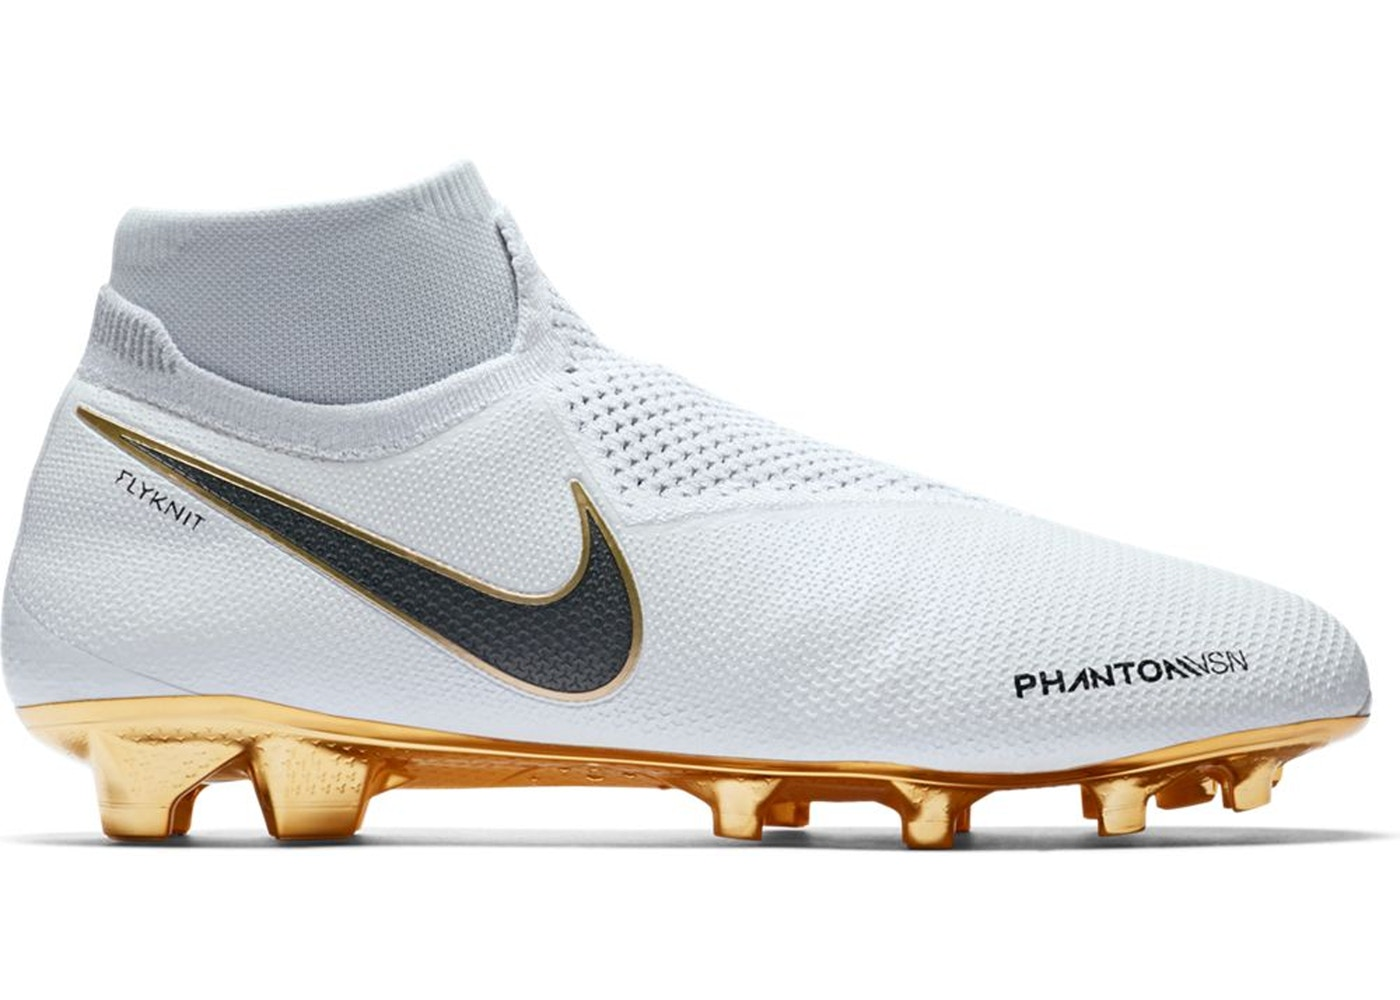 top quality 100% quality speical offer Nike Phantom Vision Elite DF FG White Metallic Gold